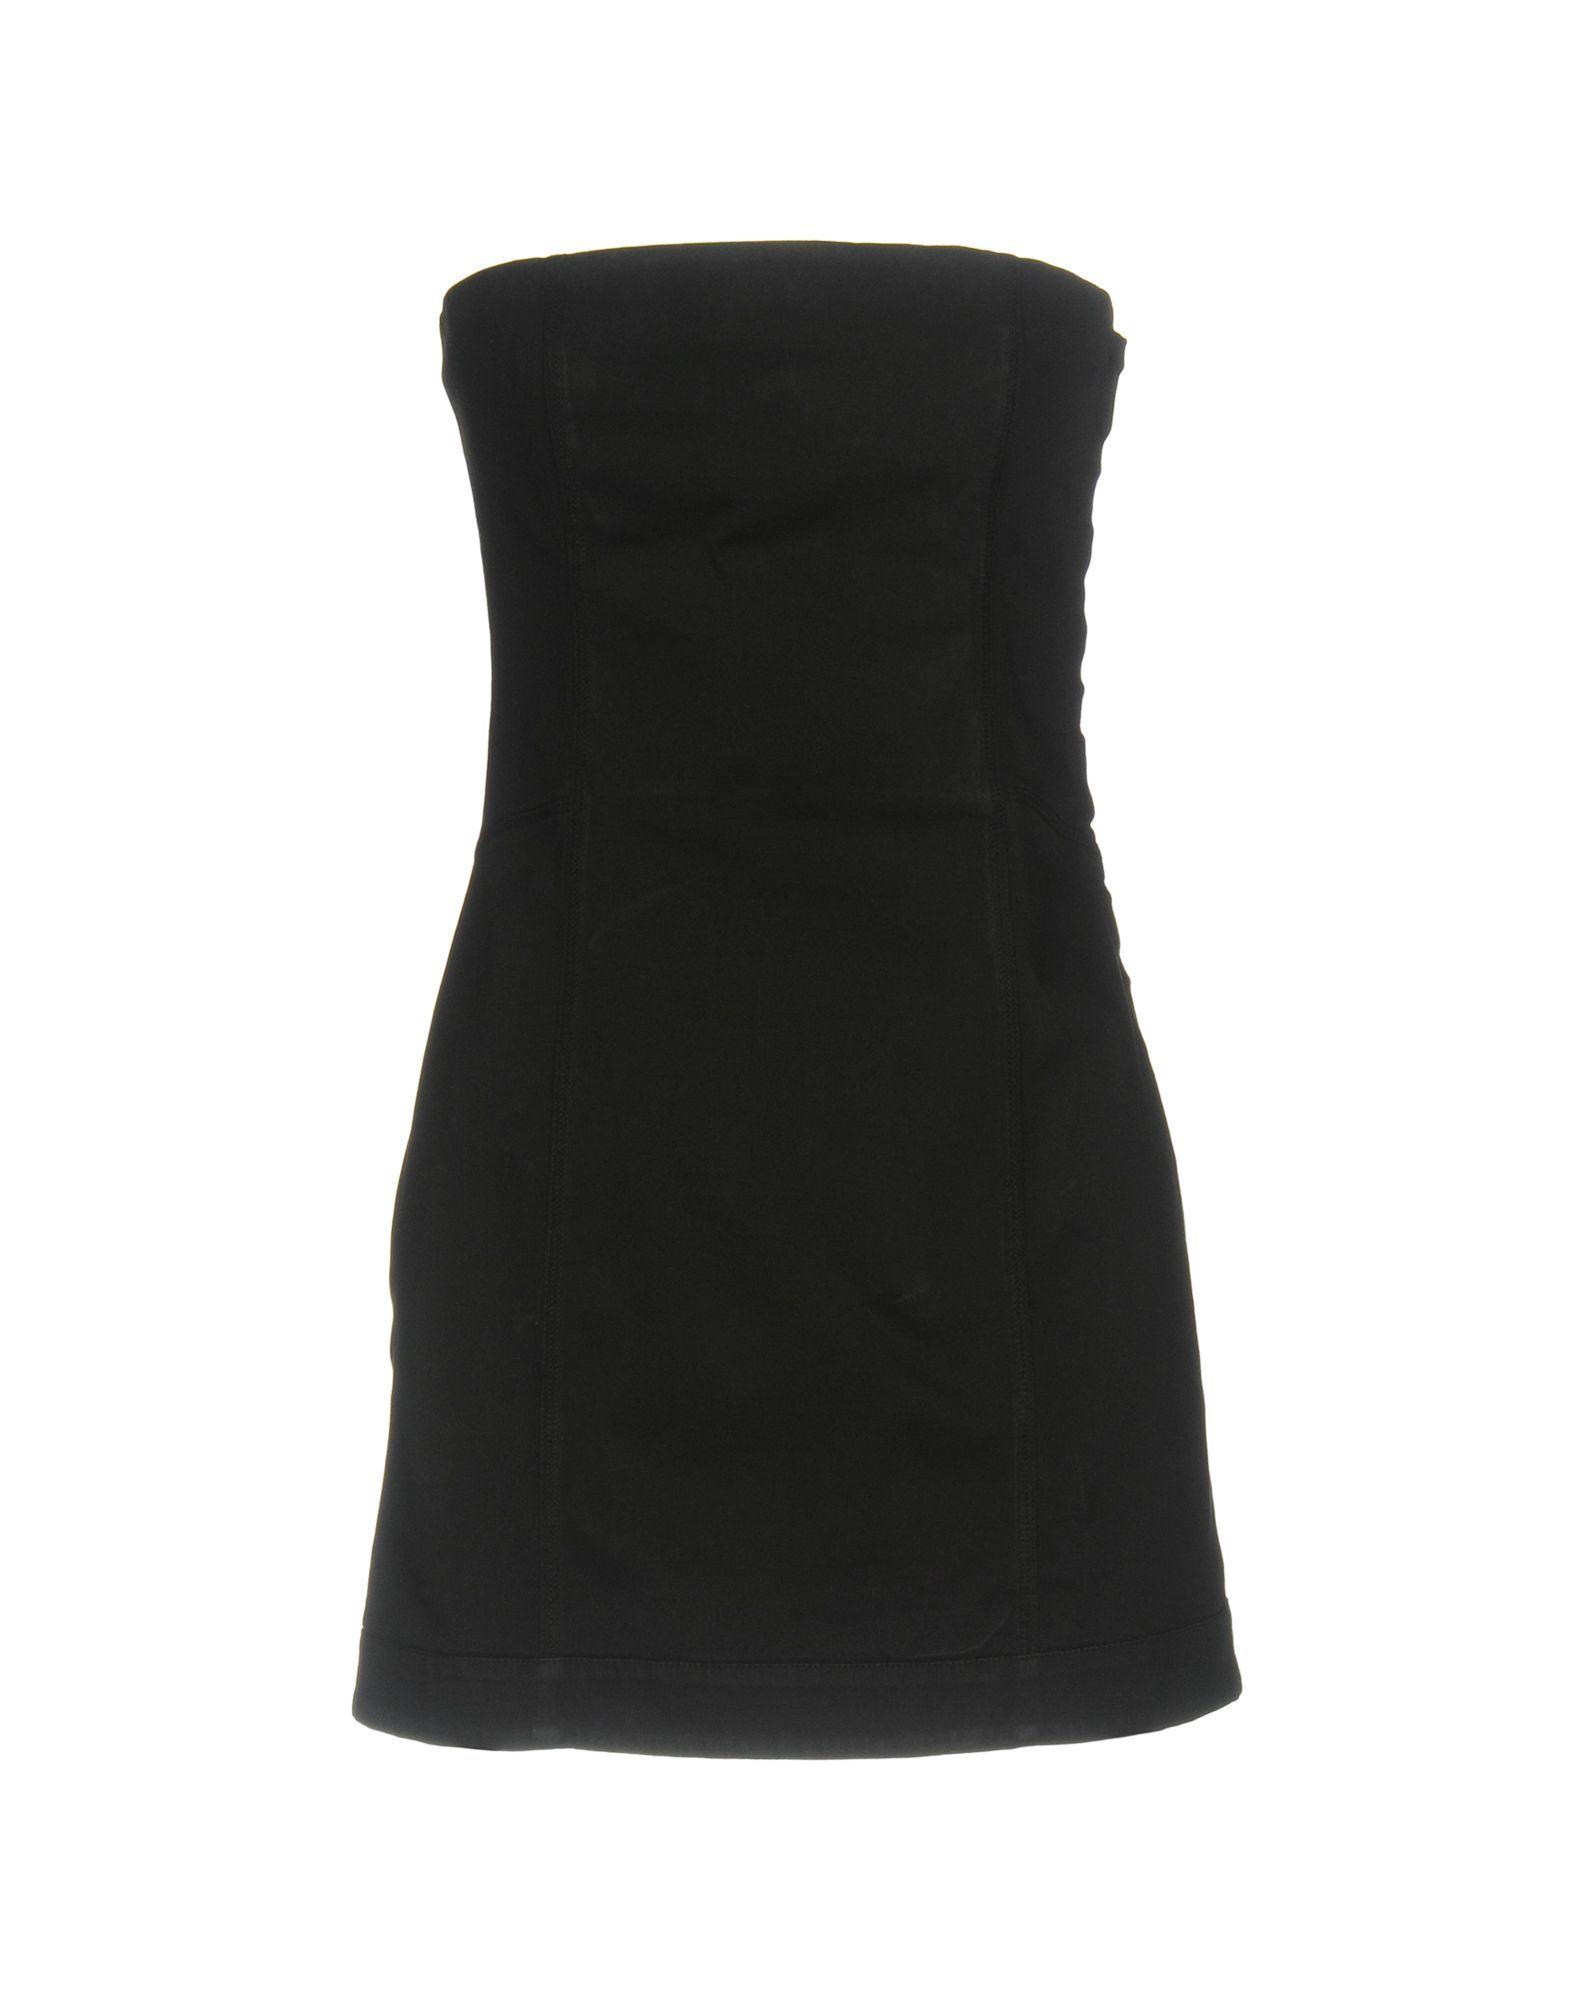 fd4a90598a4 PIERRE BALMAIN SHORT DRESSES.  pierrebalmain  cloth